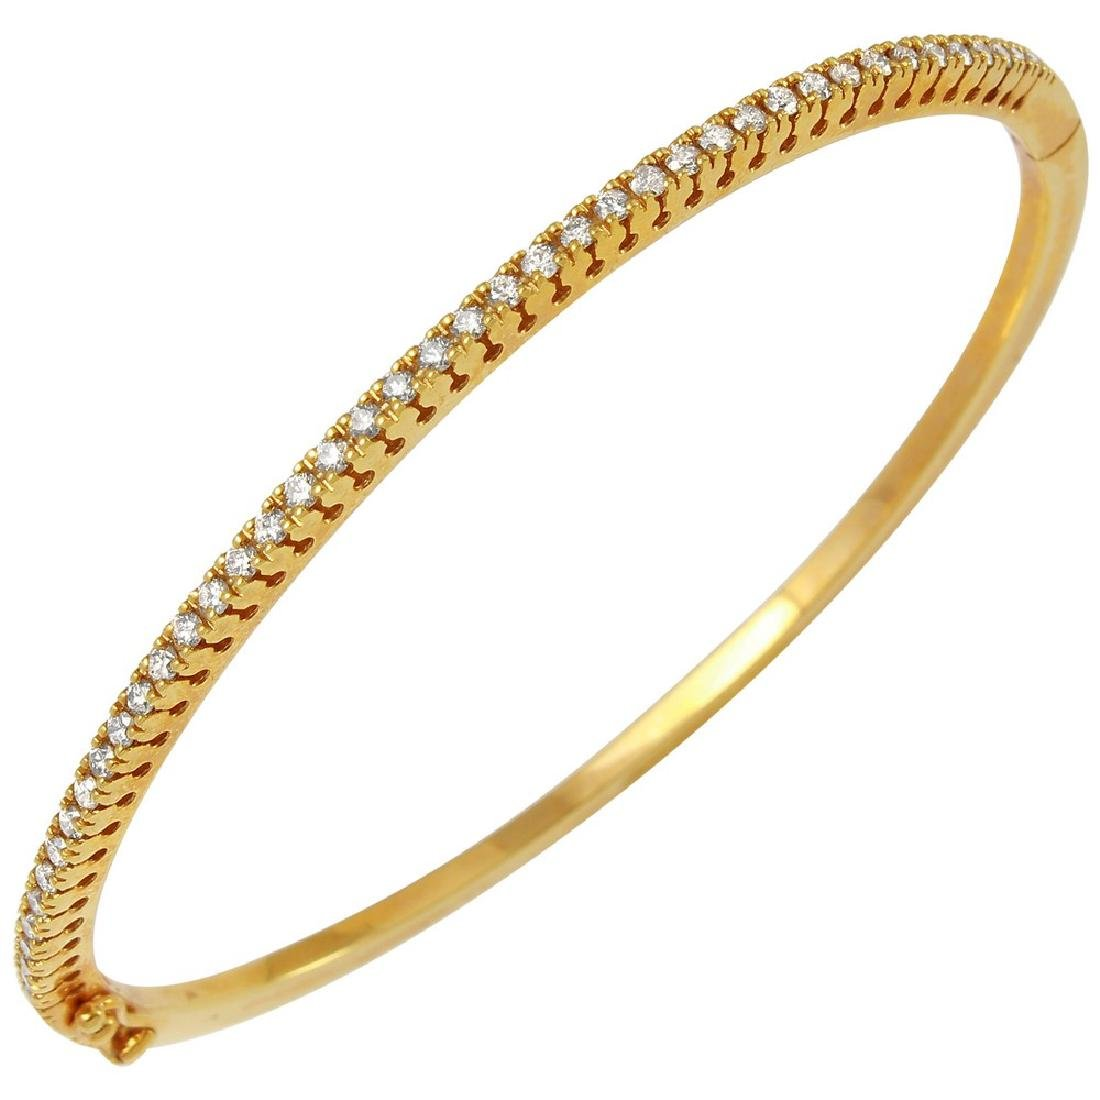 0.84CTW Diamond Bangle Bracelet in 14K Yellow Gold - 2